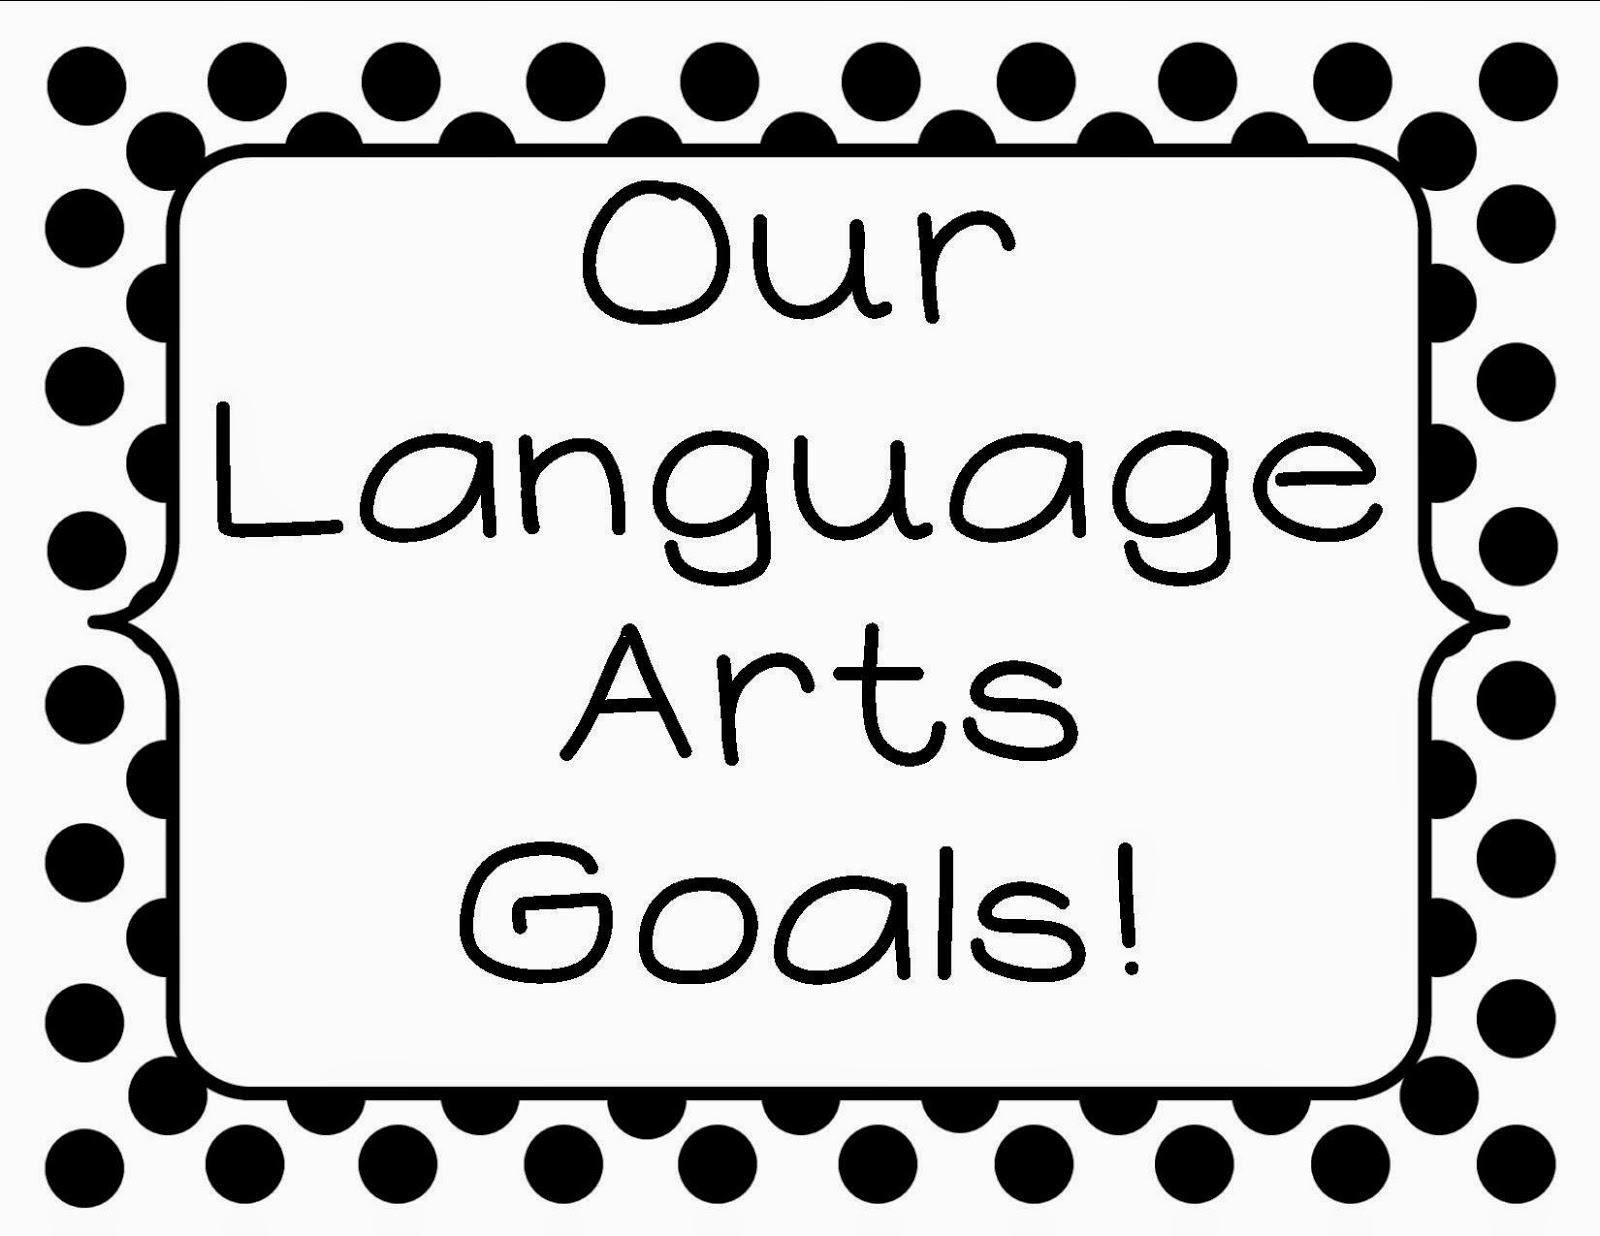 http://www.teacherspayteachers.com/Product/4th-Grade-Common-Core-Standards-Poster-Set-Flash-Freebie-1414494